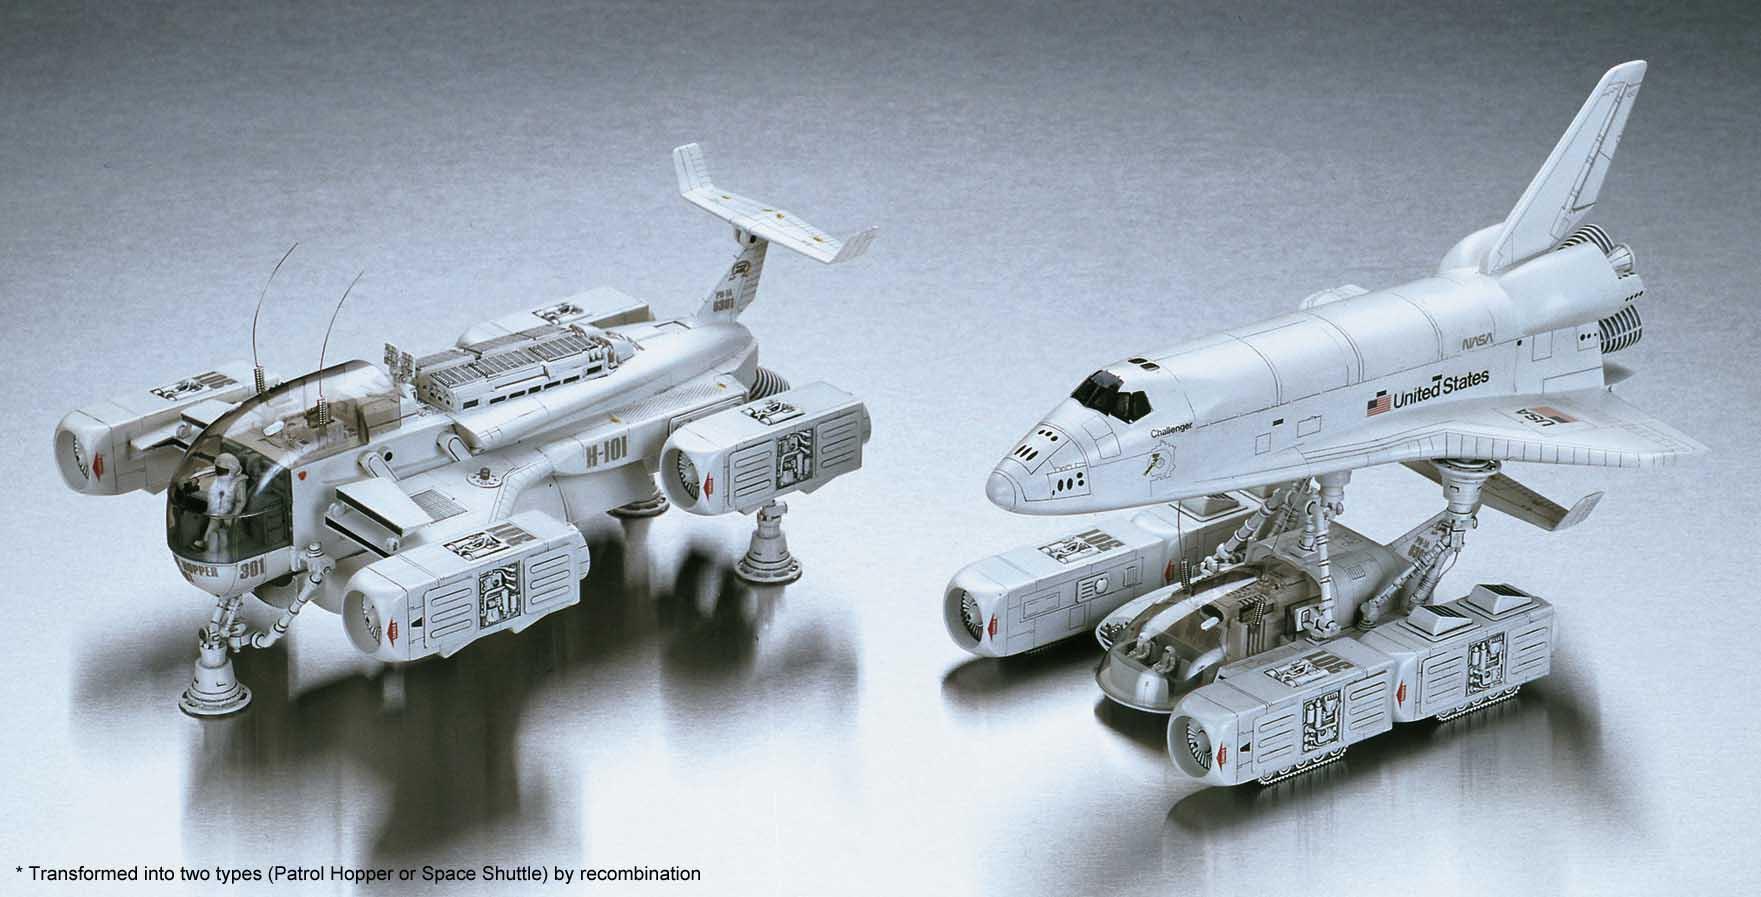 Hasegawa 1/48 Operation Omega Space Shuttle (1/144) / Patrol Hopper (1/48)